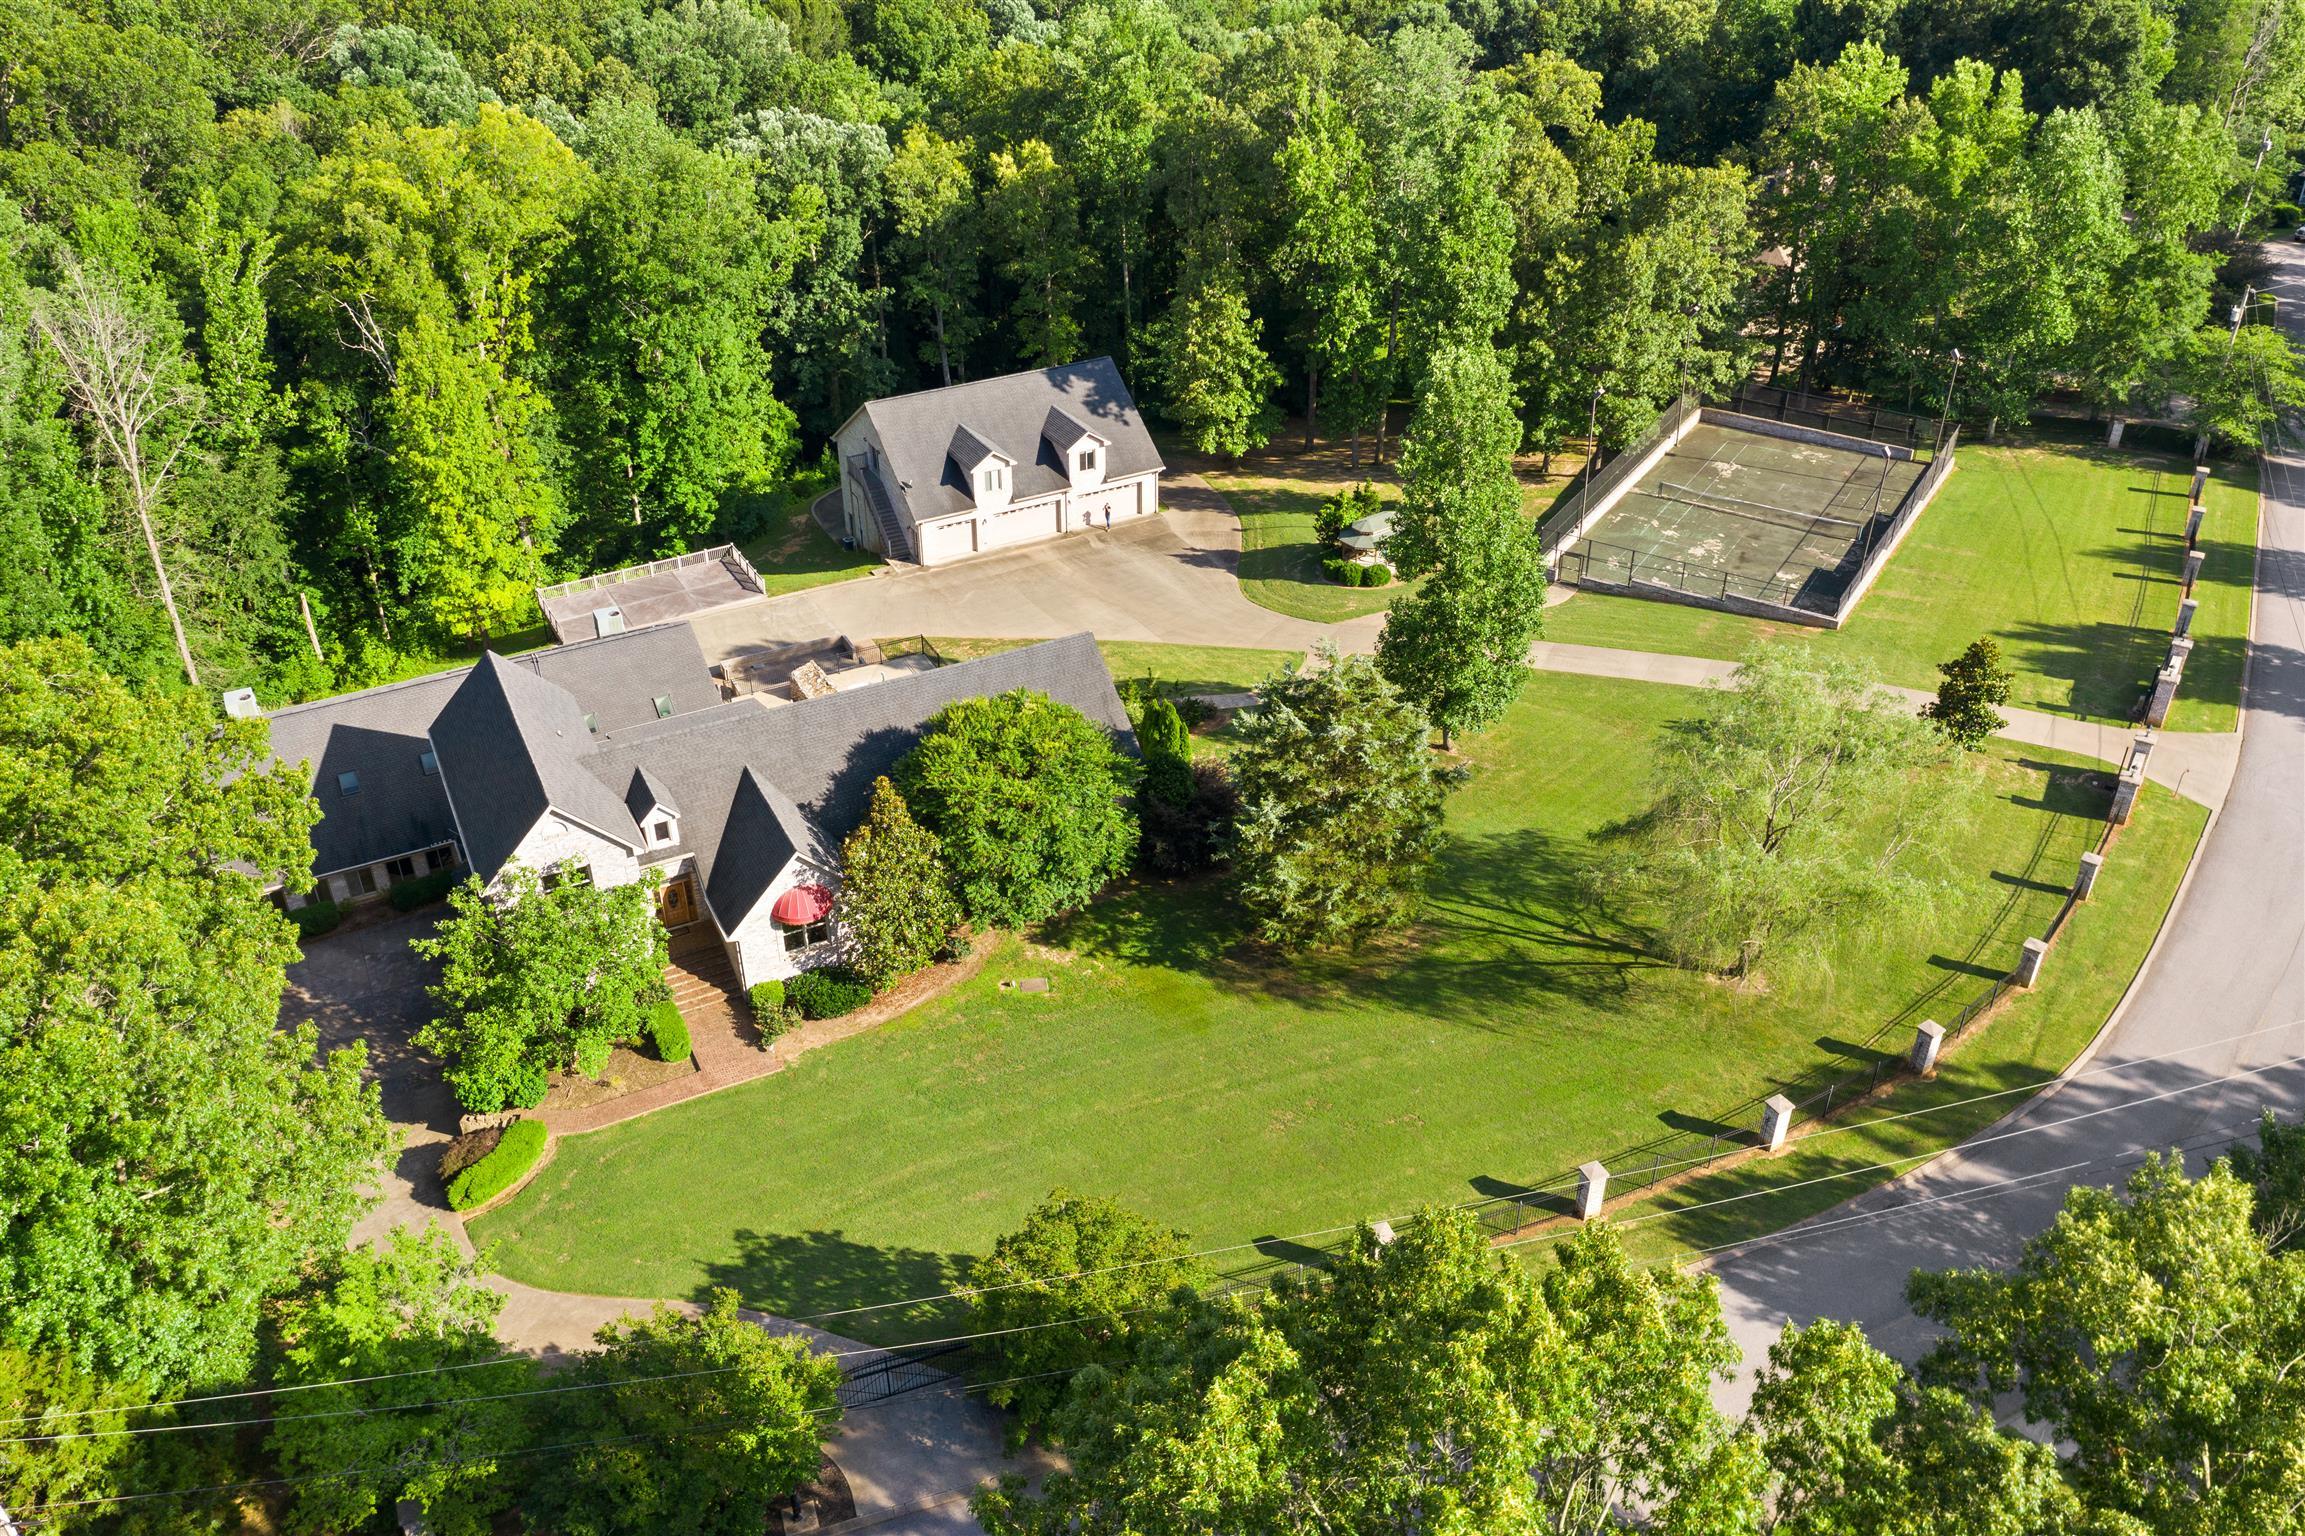 4975 Shadowbend Cir, Clarksville, TN 37043 - Clarksville, TN real estate listing